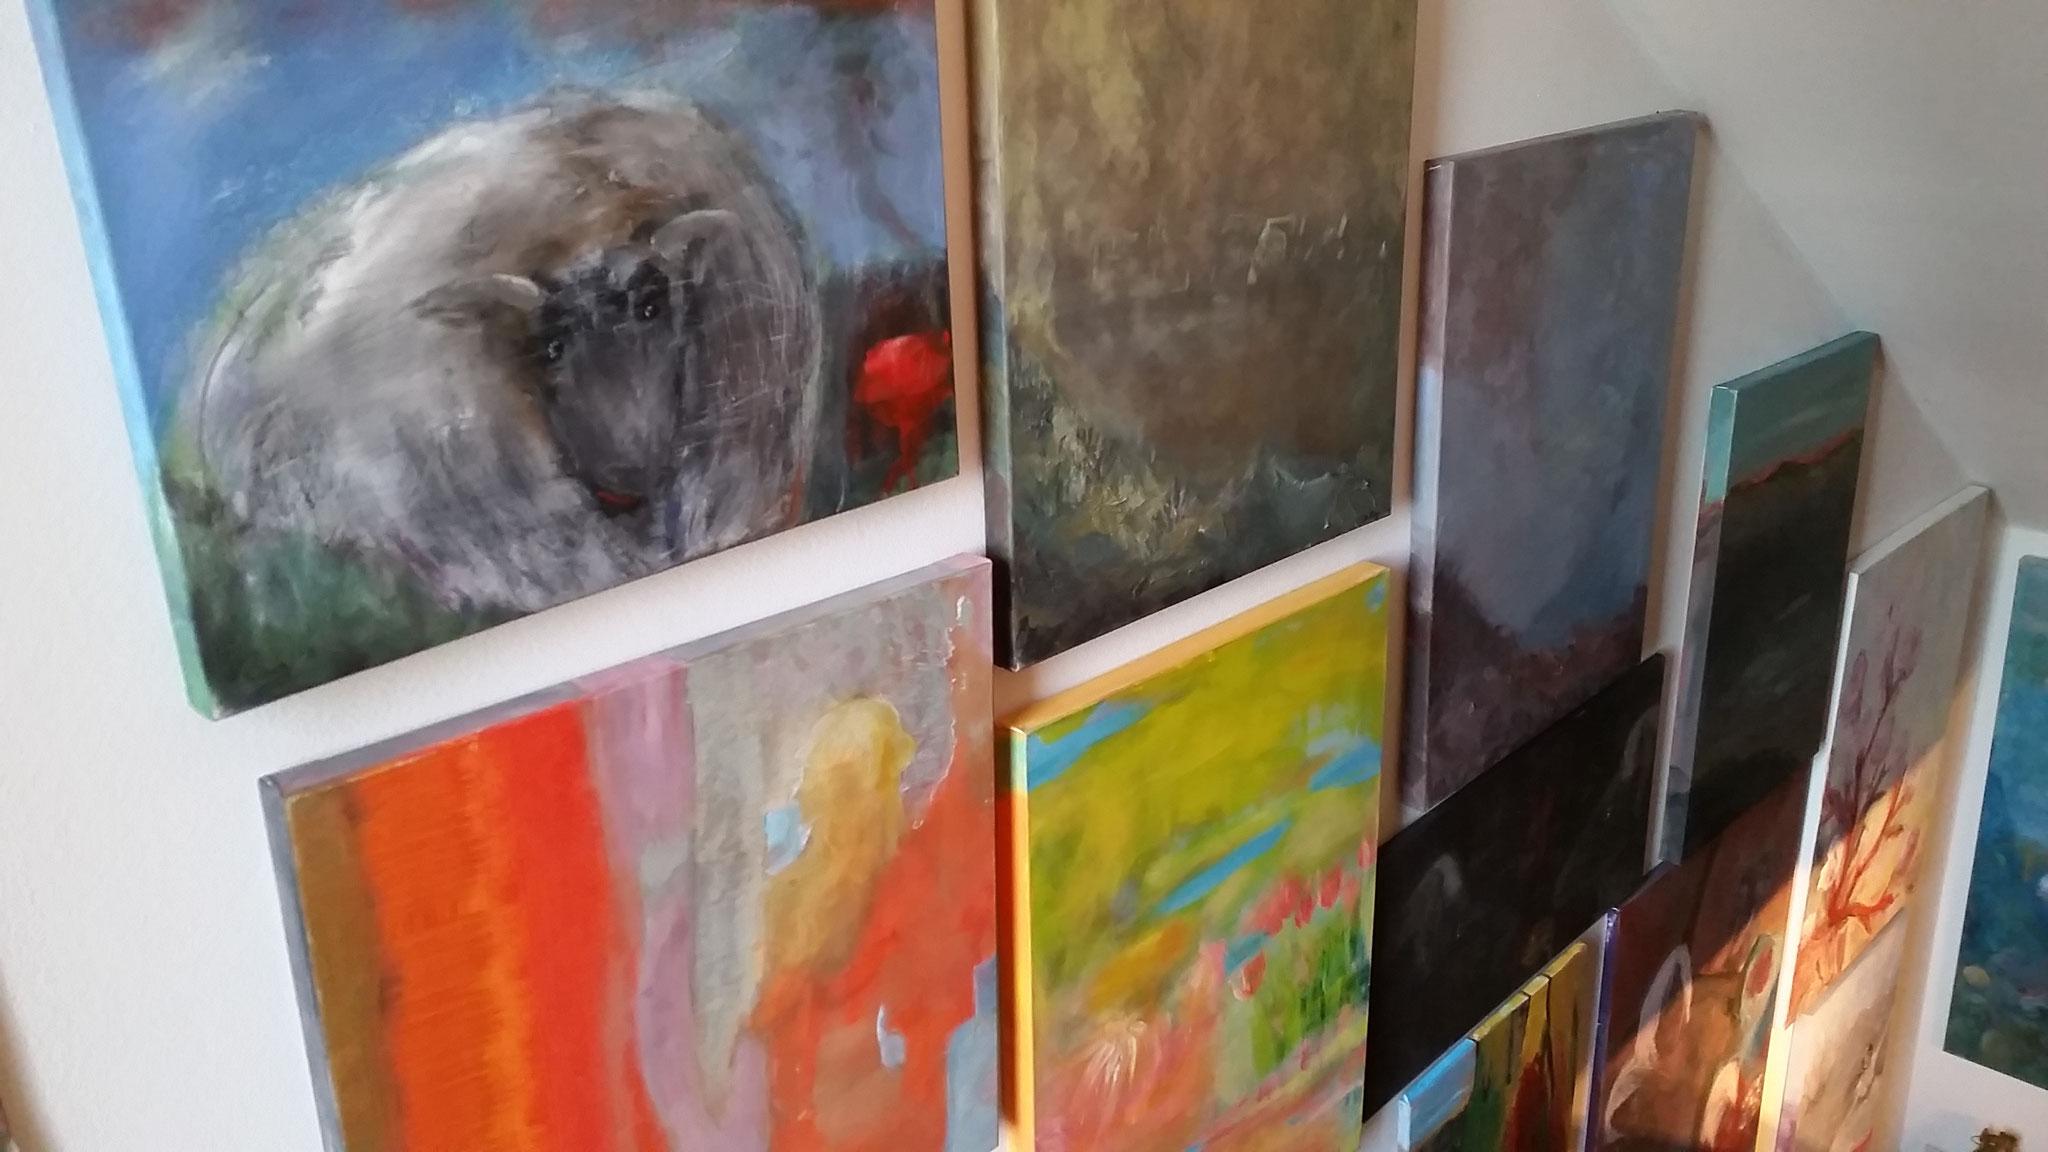 Treppen-Galerie 3, Maler Künstlerin Bozana